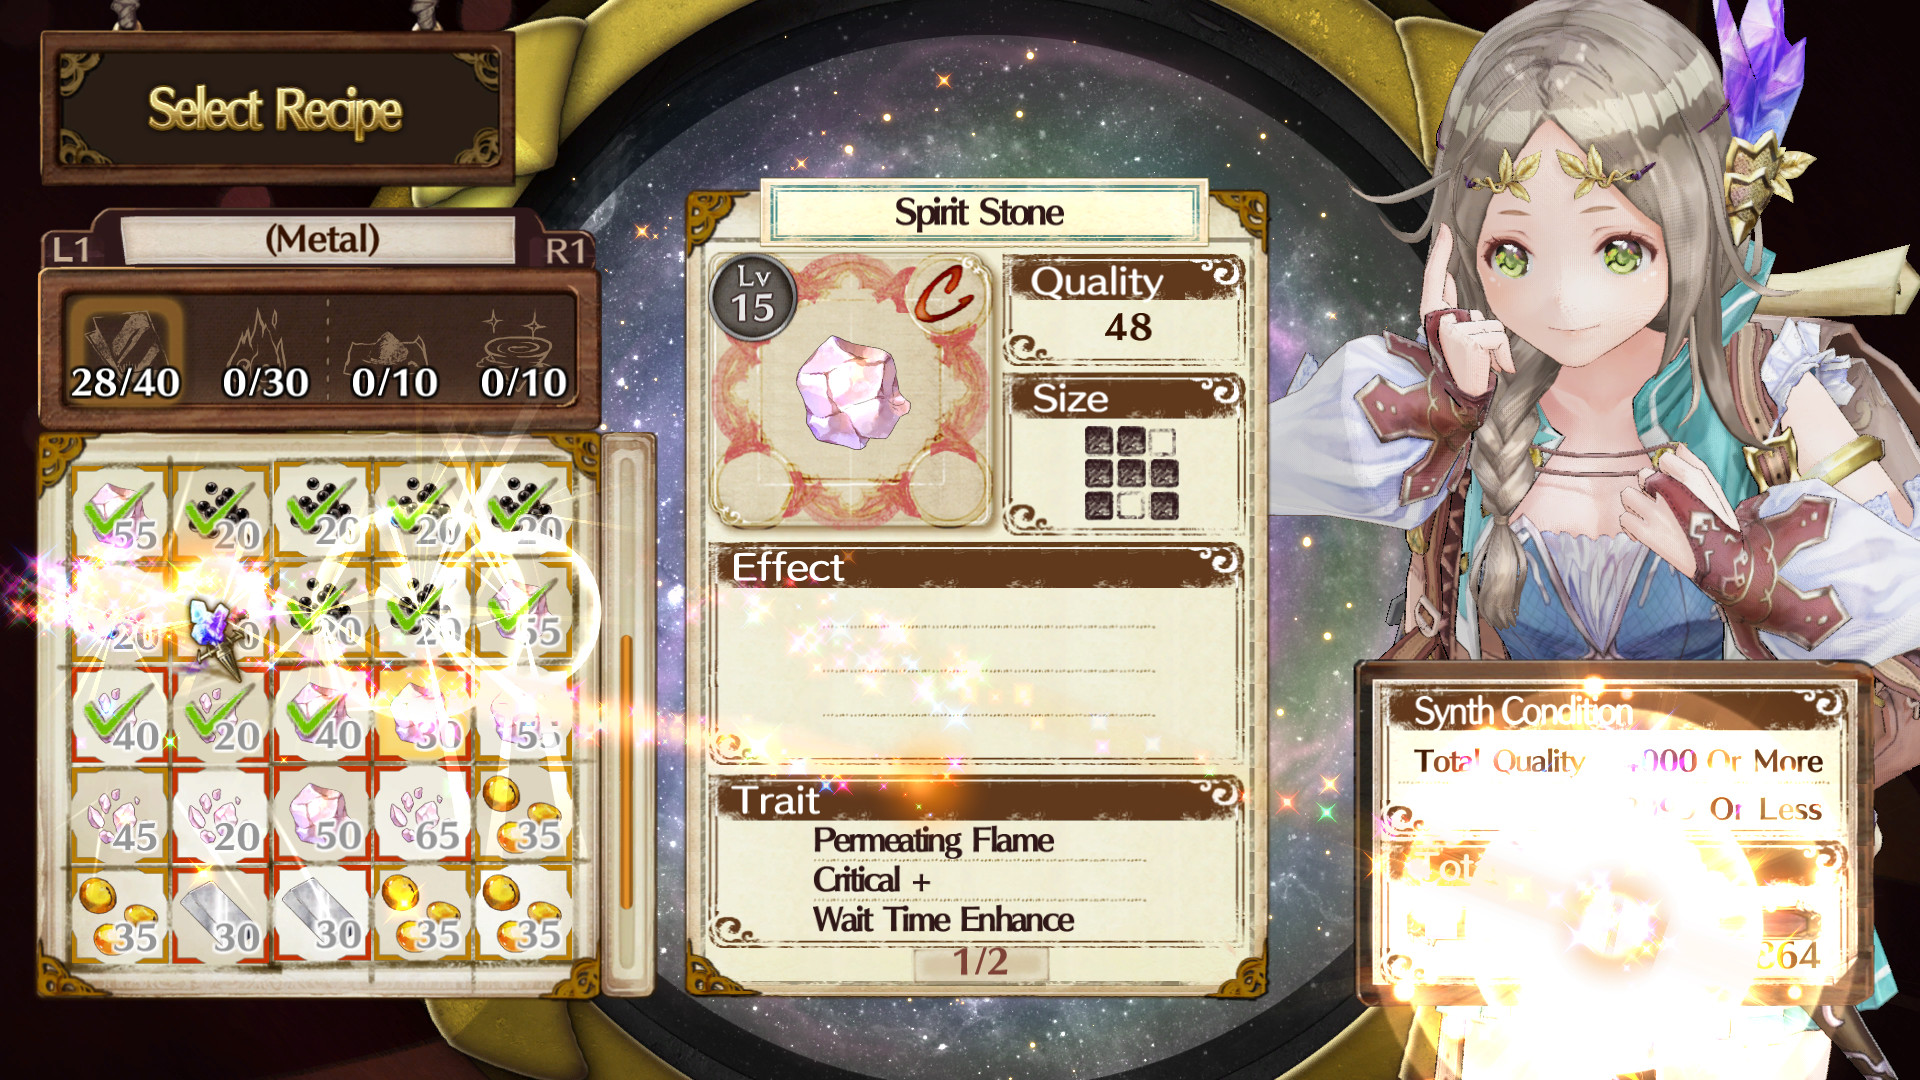 Atelier Firis: The Alchemist and the Mysterious Journey DX PC Fiyatları